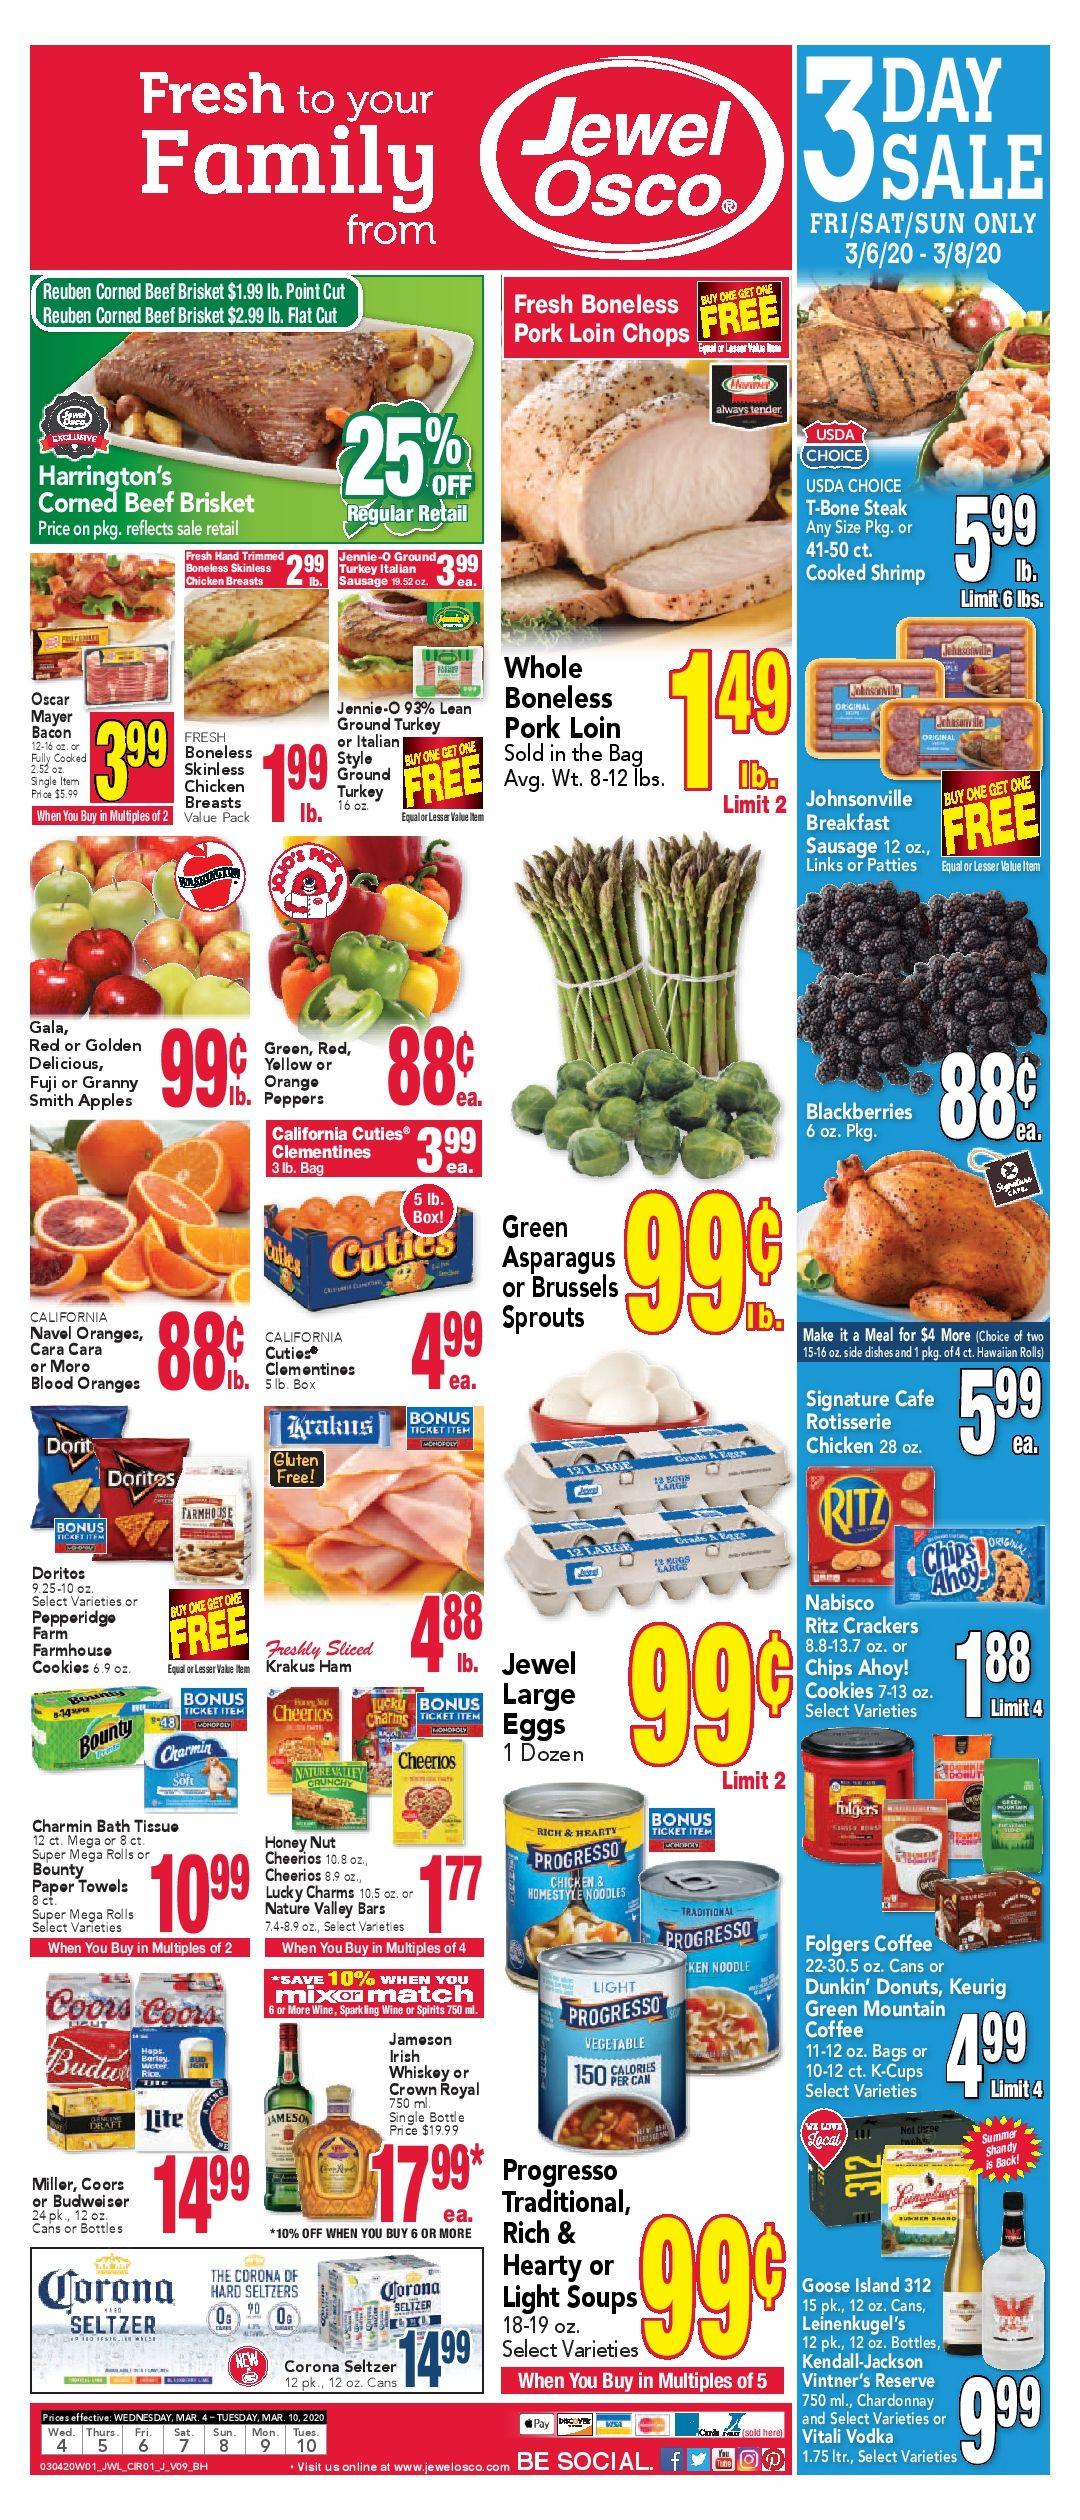 JewelOsco Weekly ad Flyer 03/11/20 03/17/20 Sale